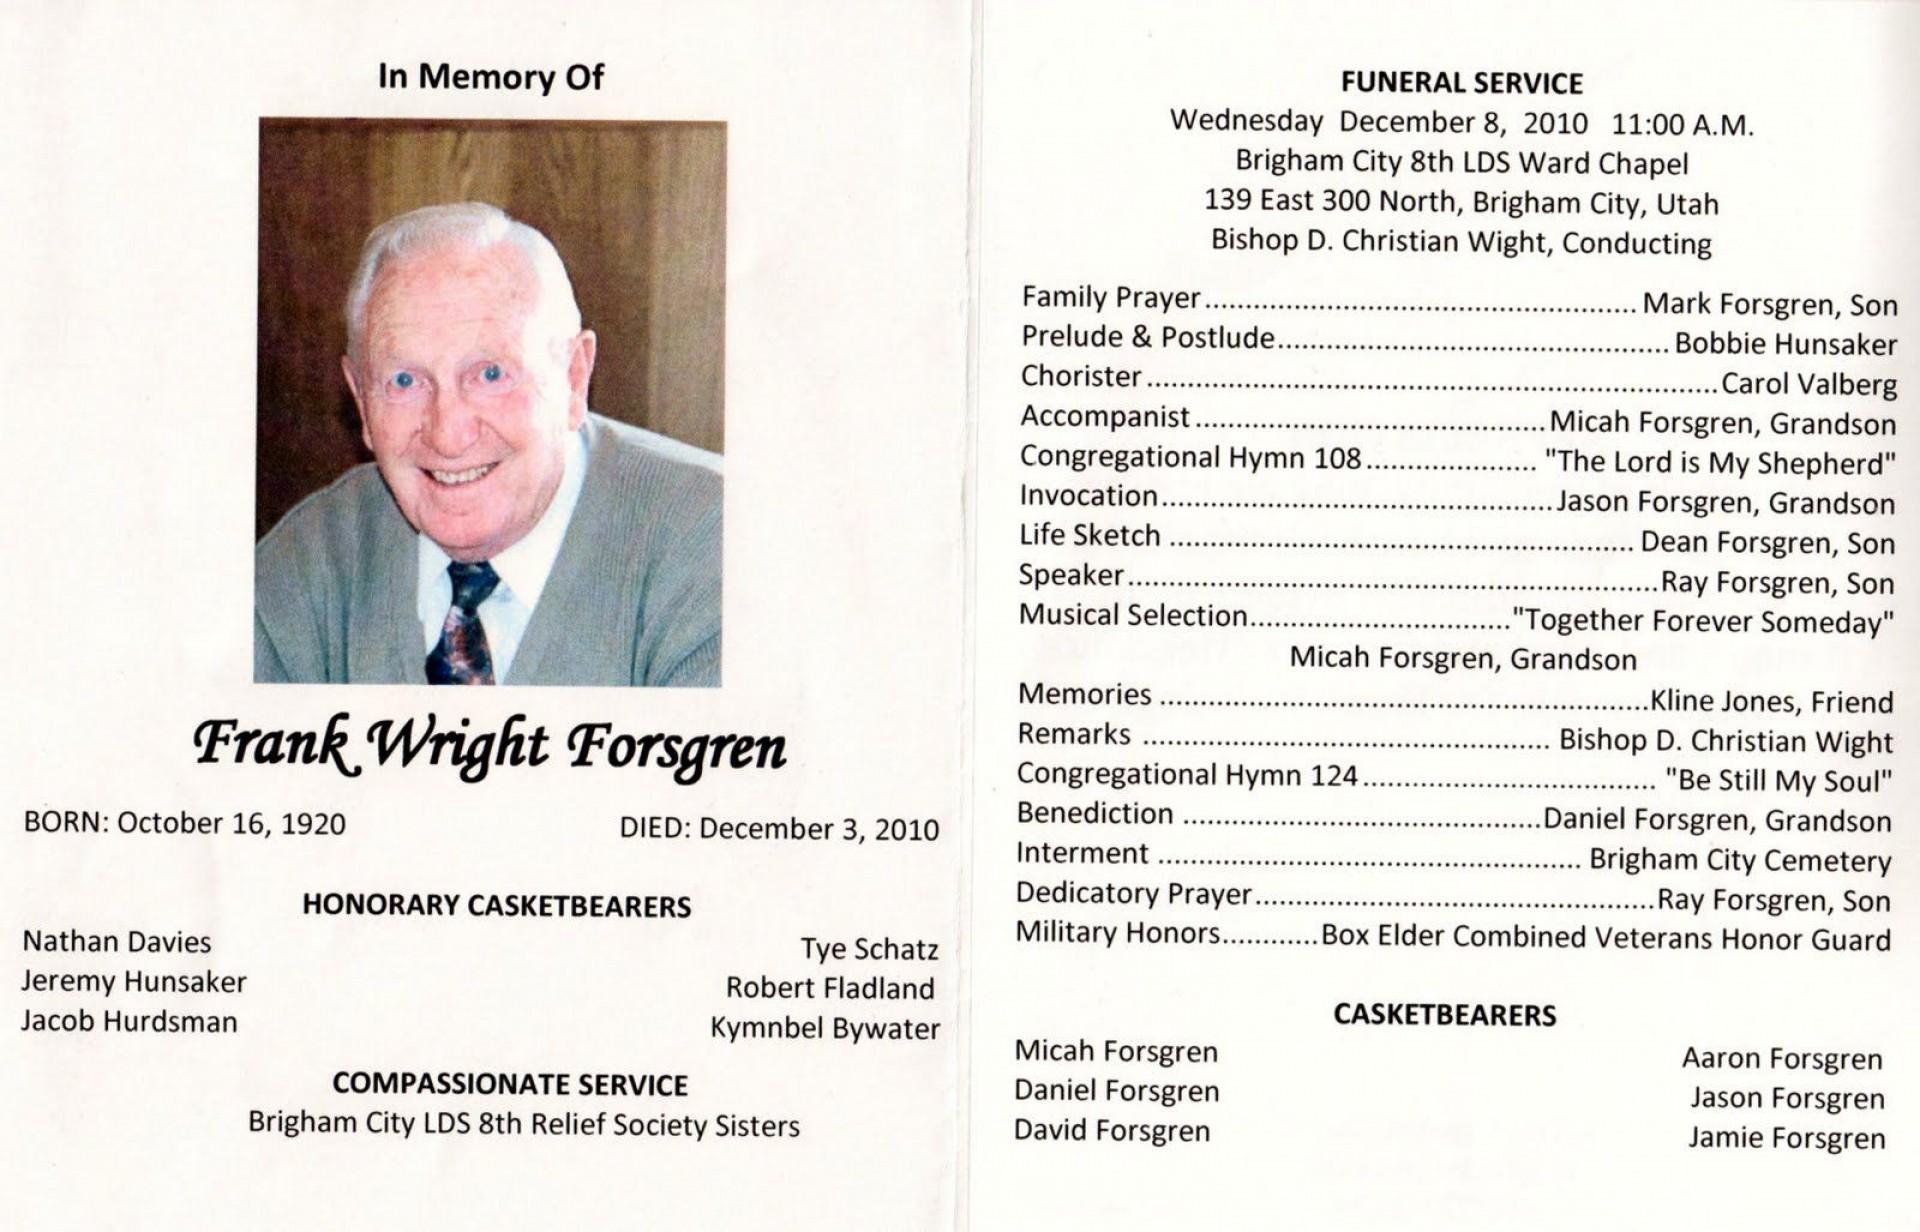 003 Awful Catholic Funeral Program Template Highest Quality  Mas Layout Free1920